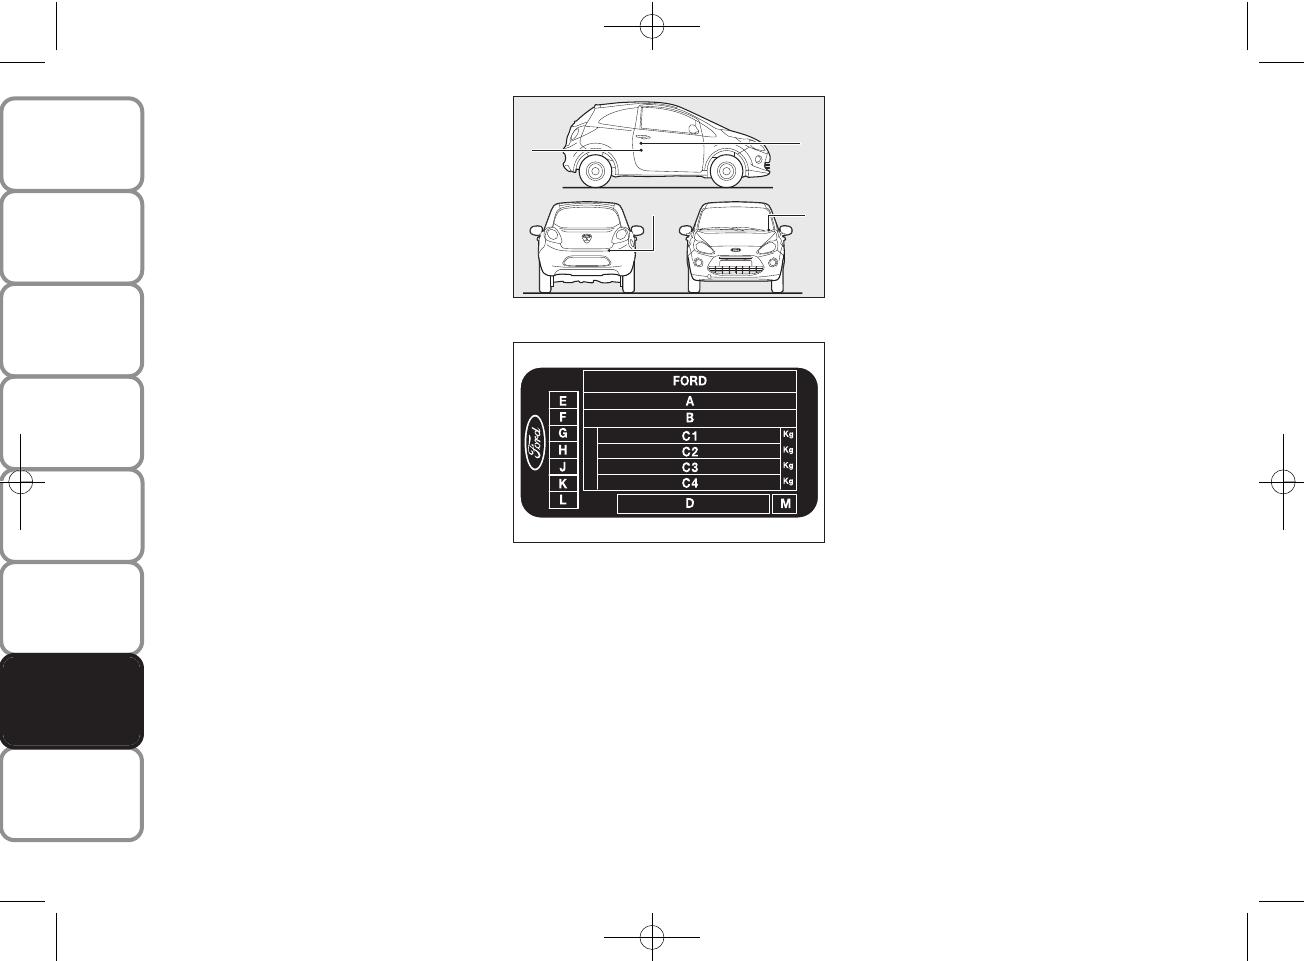 Handleiding Ford Ka Pagina 153 Van 189 Nederlands